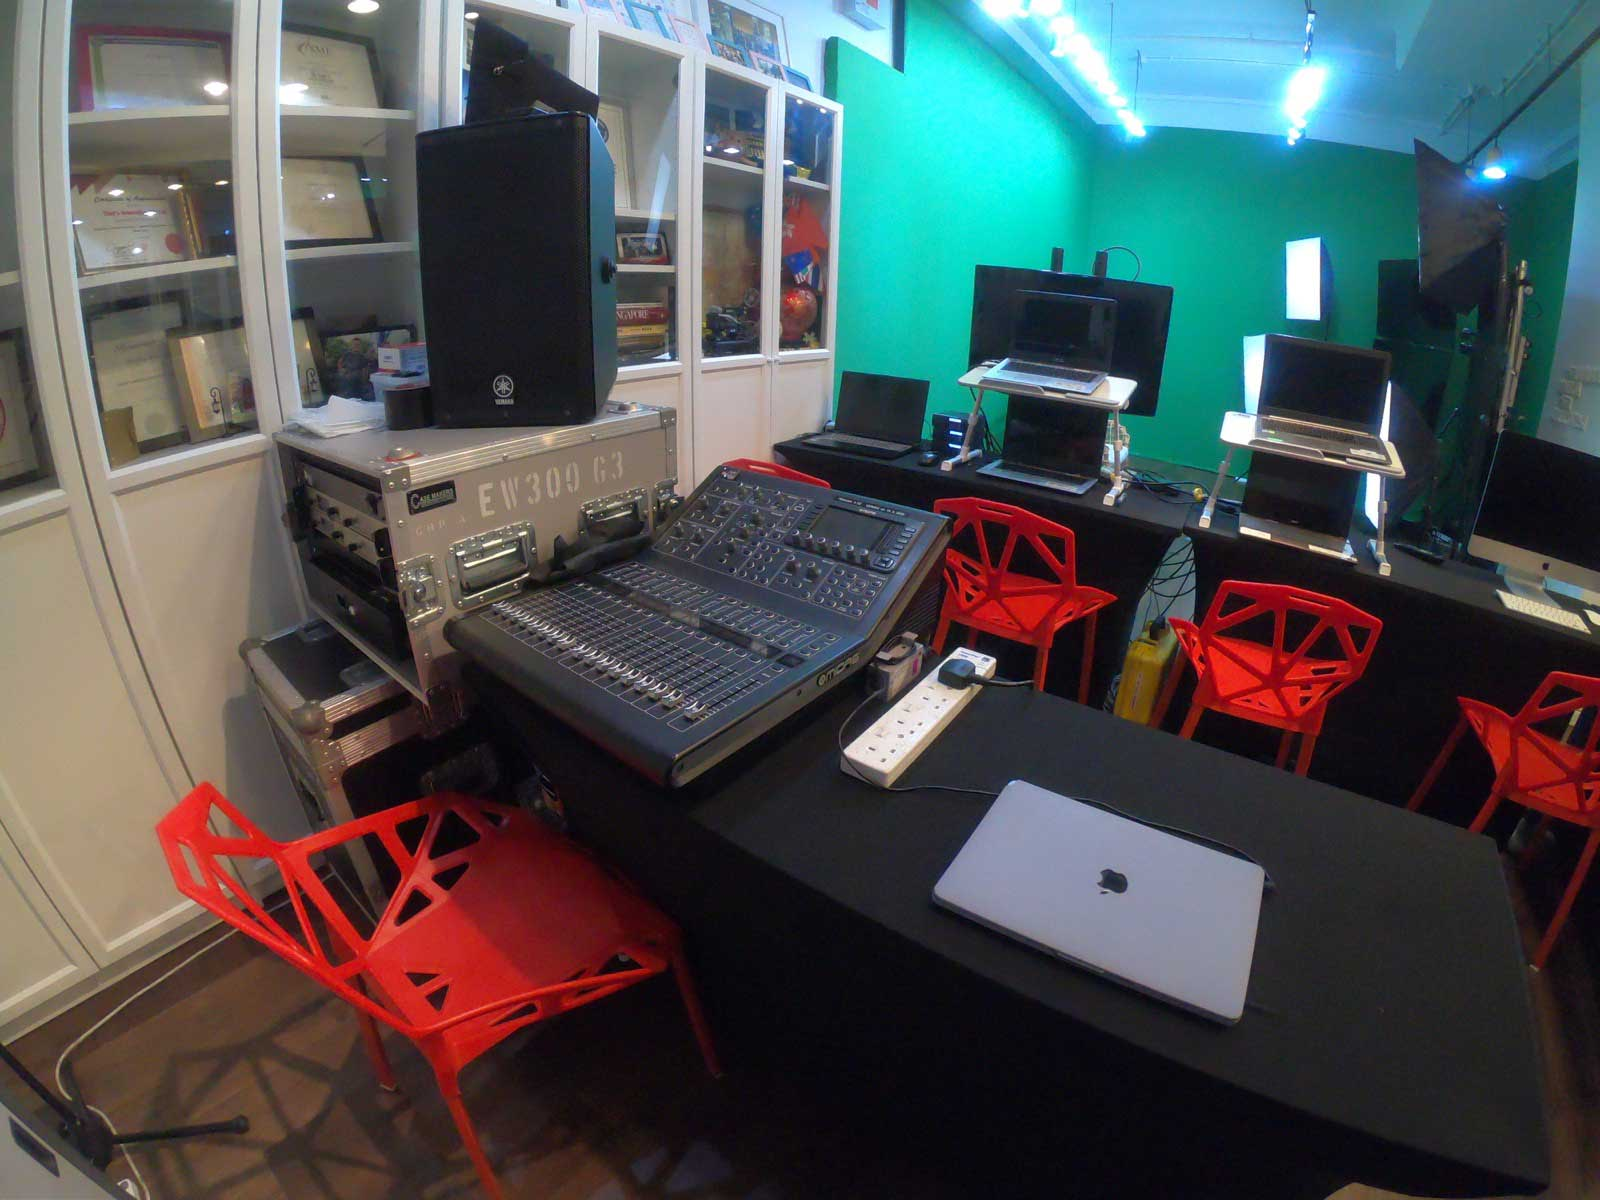 green_screen_studio_rental_full_studio_rental_west_streaming_5